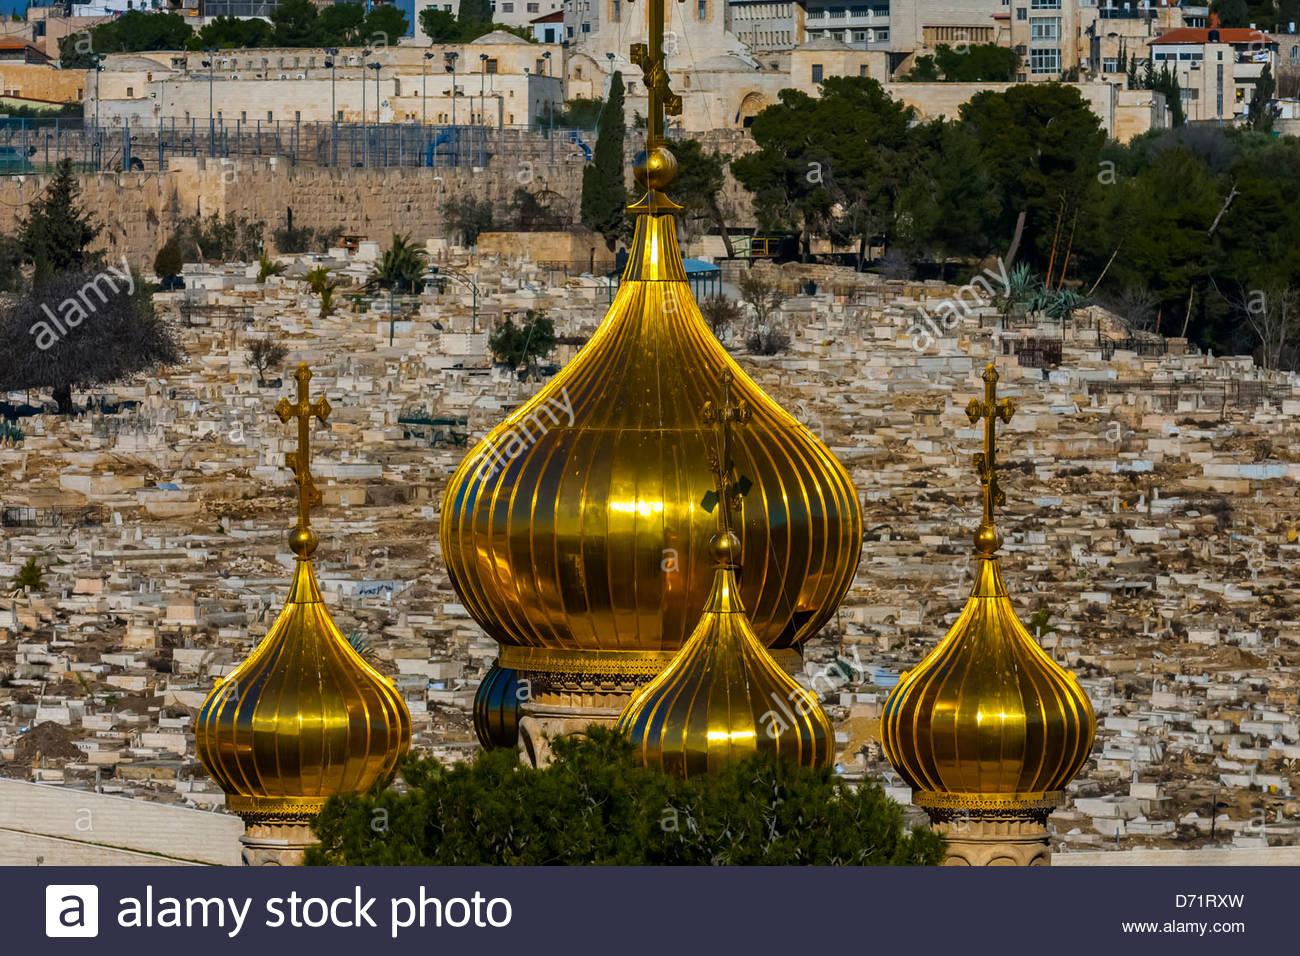 Russian Orthodox Church of Maria Magdelene, Mount of Olives, Jerusalem, Israel. - Stock Image